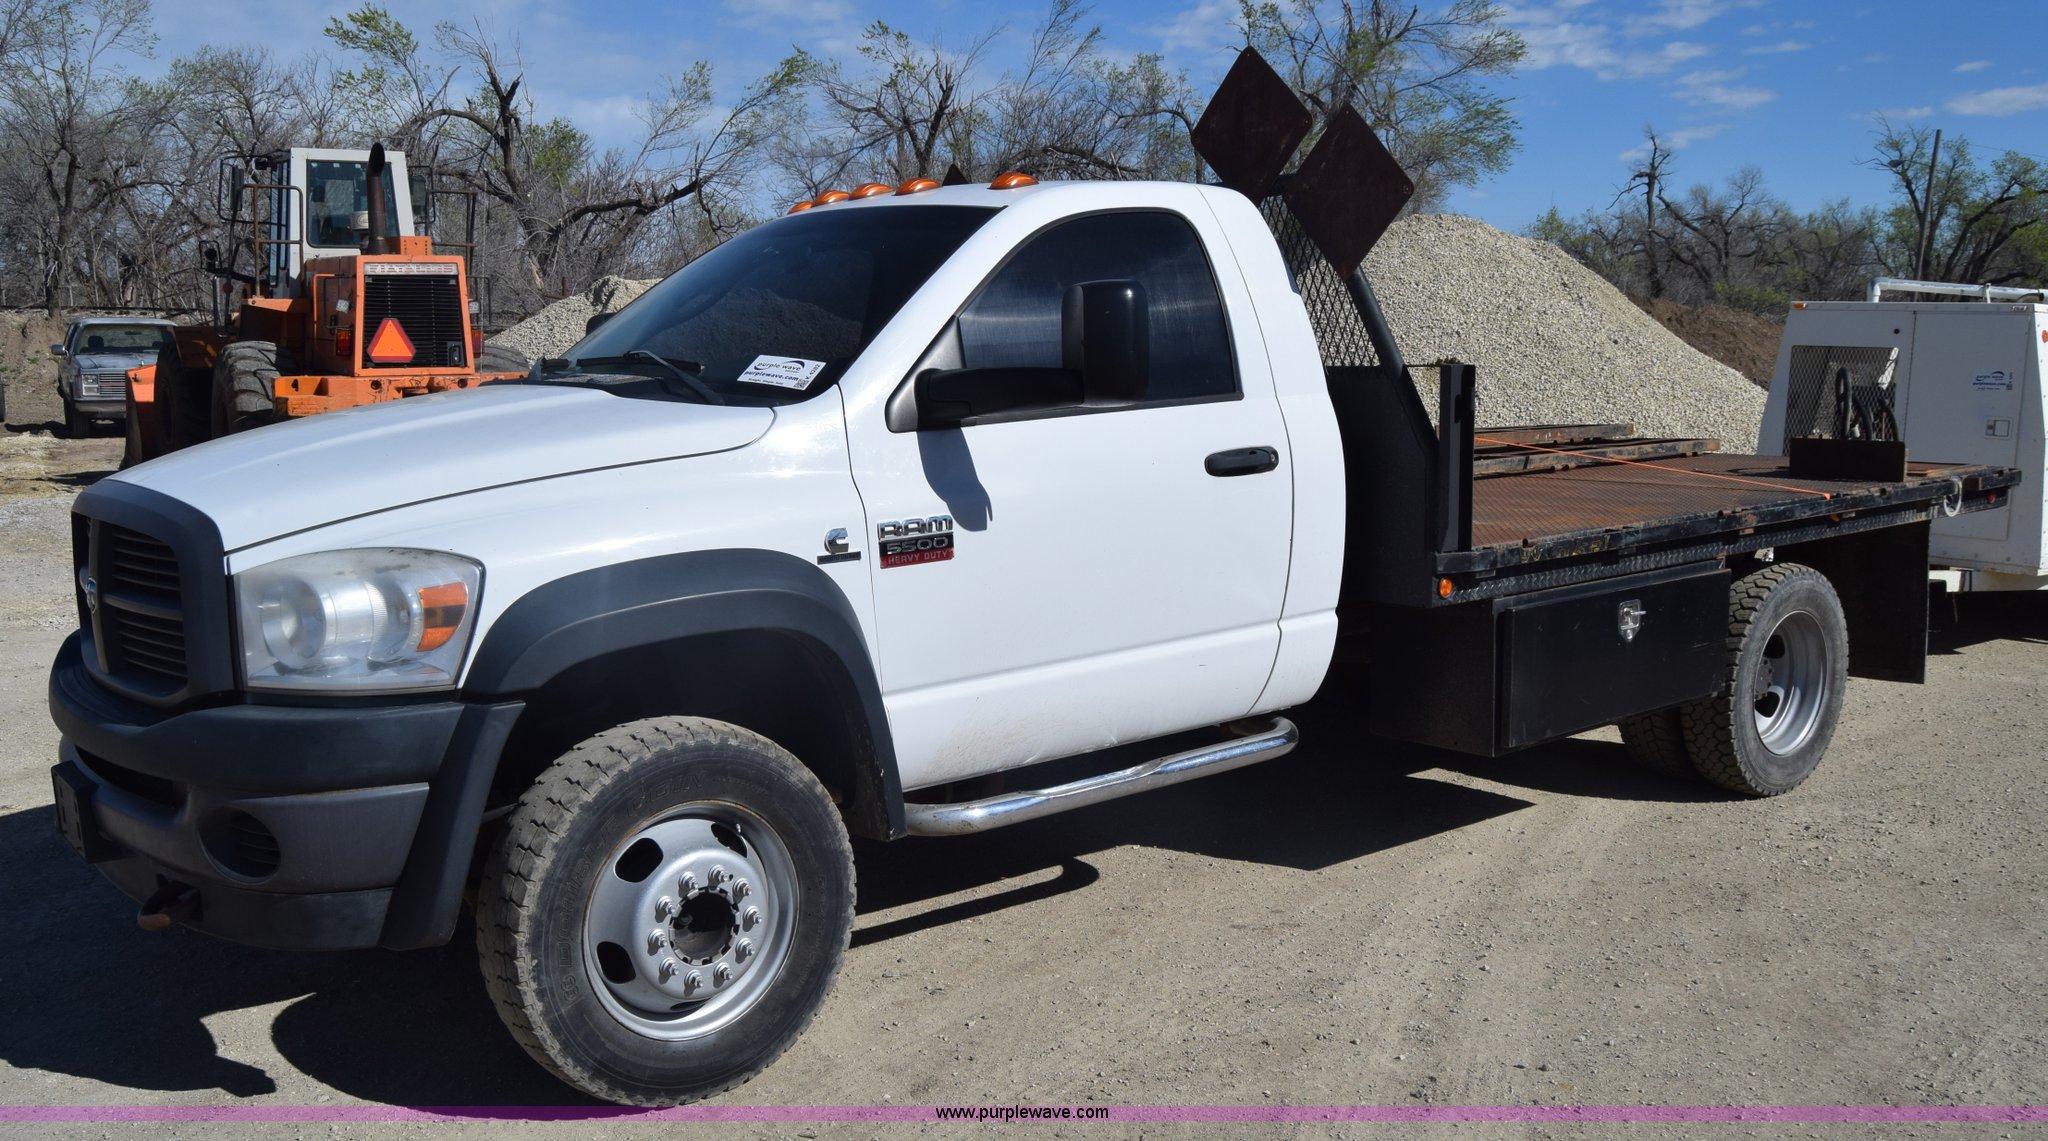 2008 Dodge Ram 5500 Flatbed Truck In Hutchinson Ks Item K4282 Sold Purple Wave